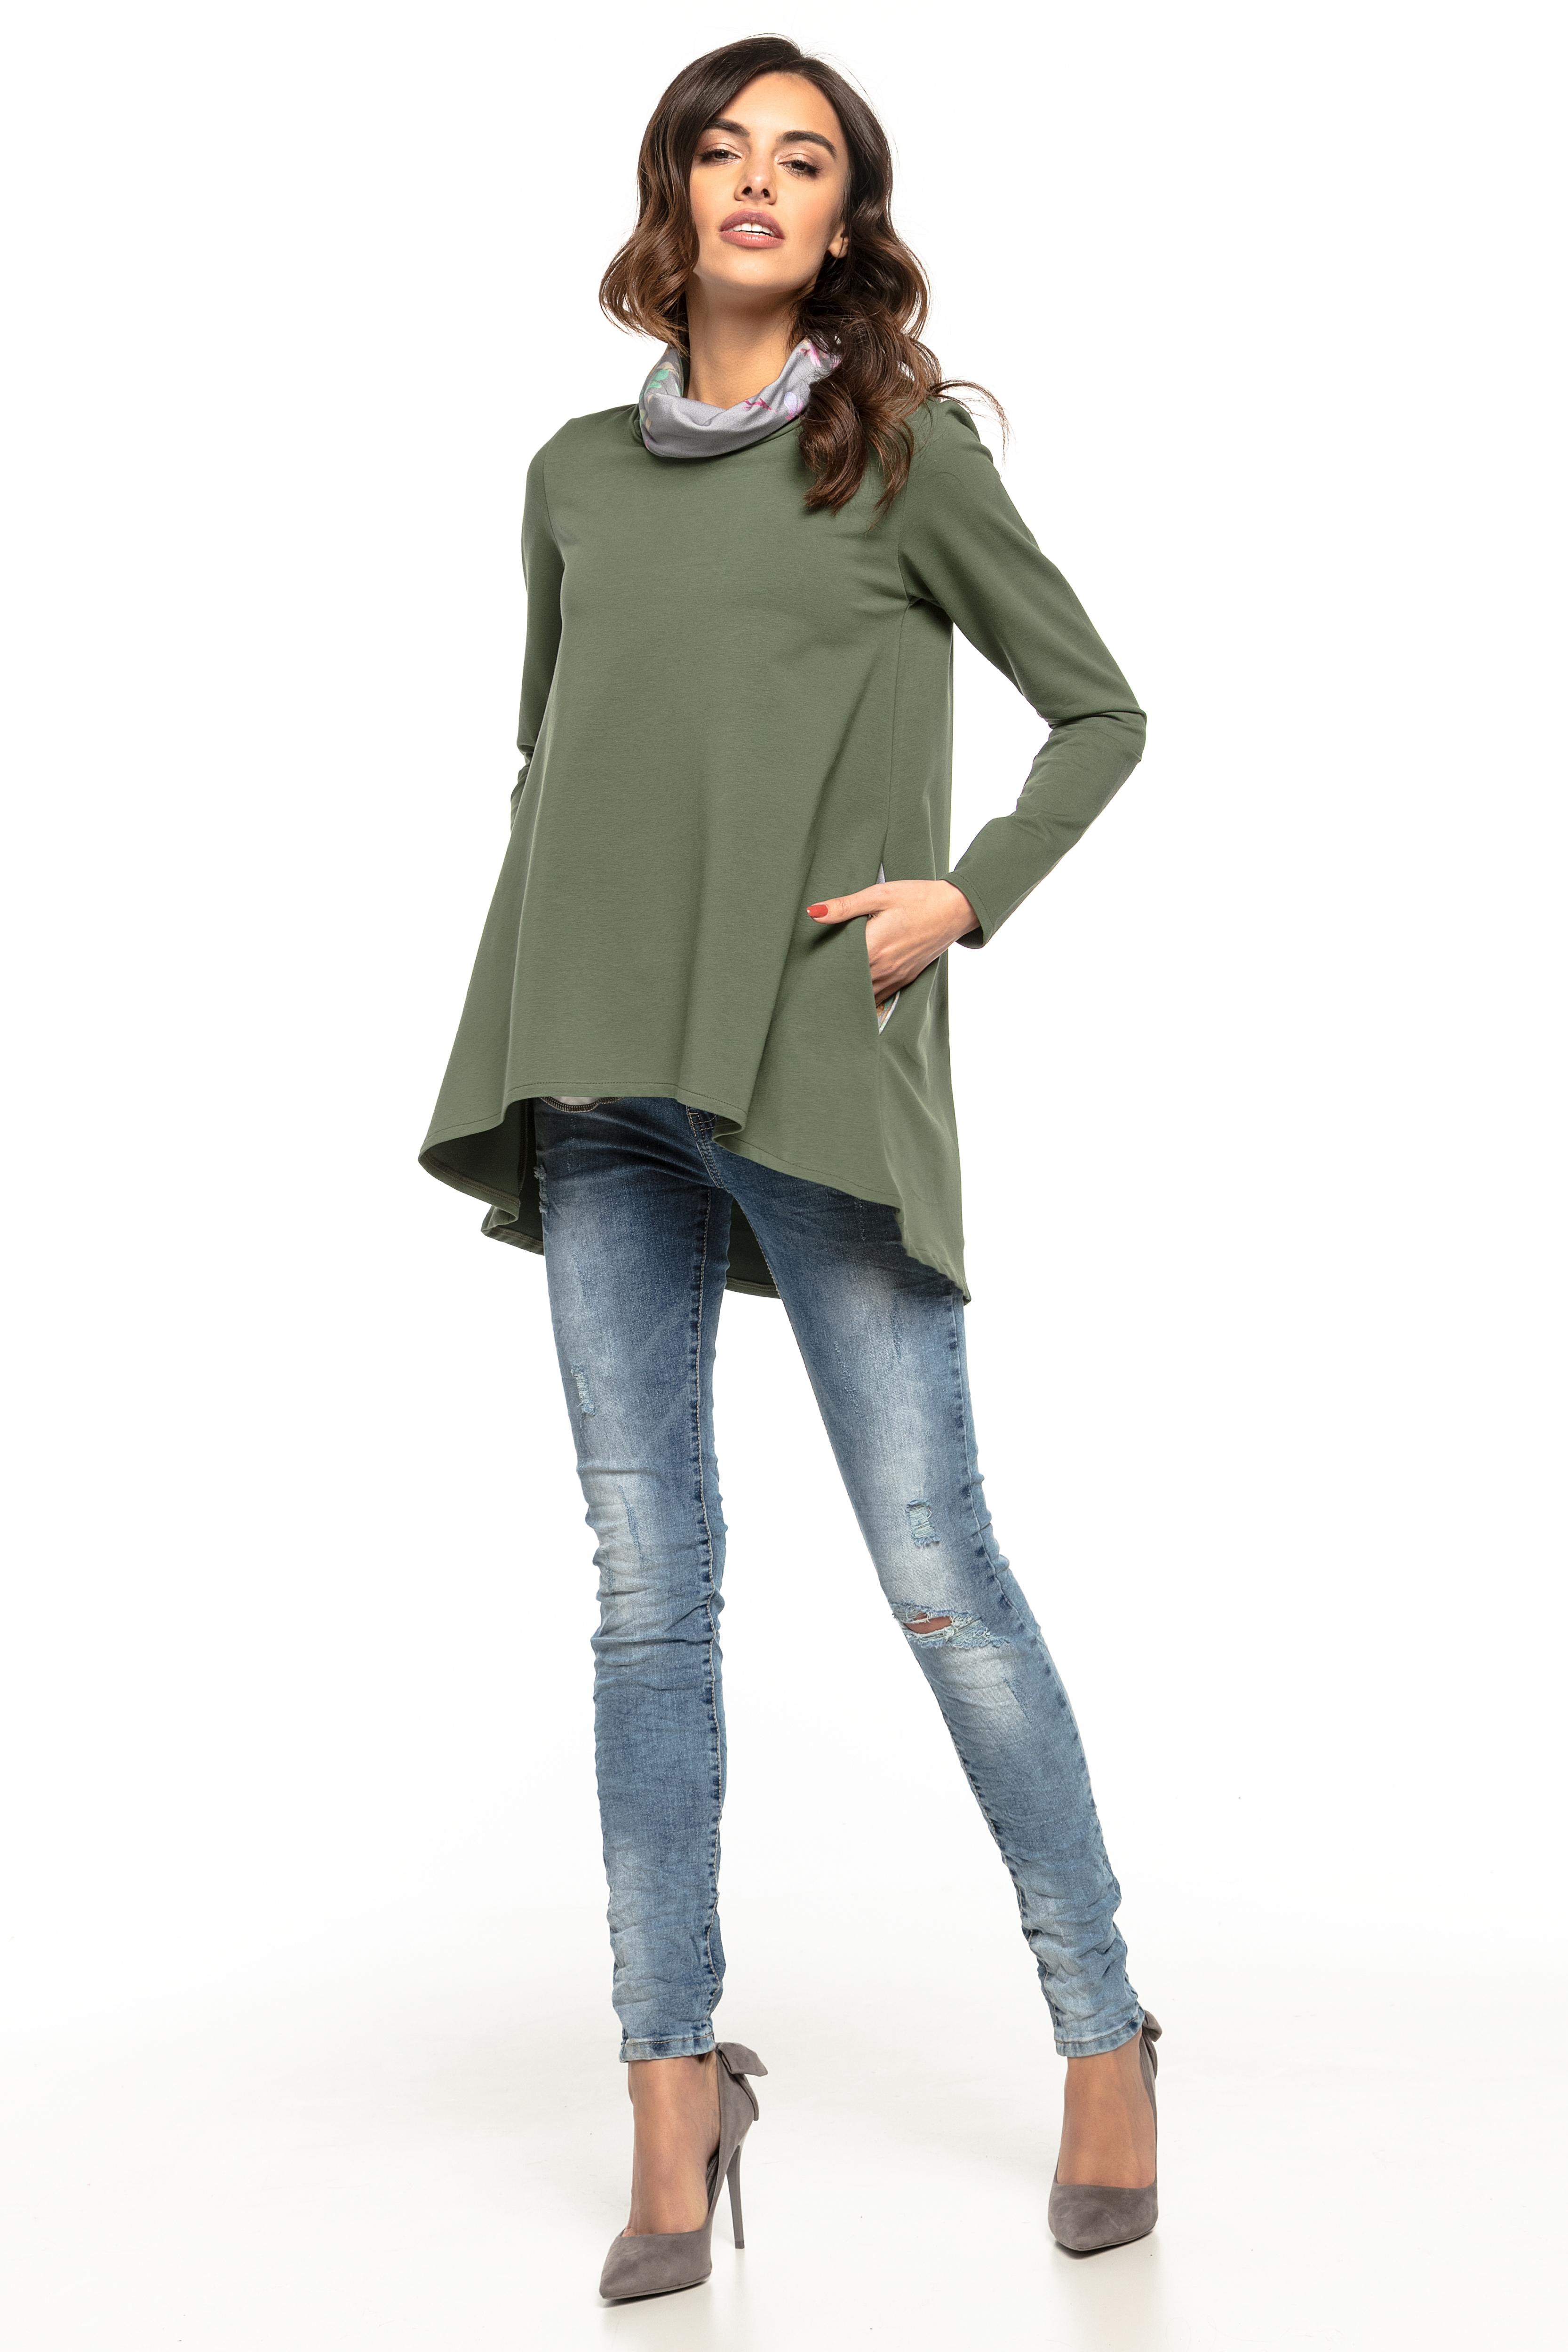 dd540060 Bluza damska oversize zielona